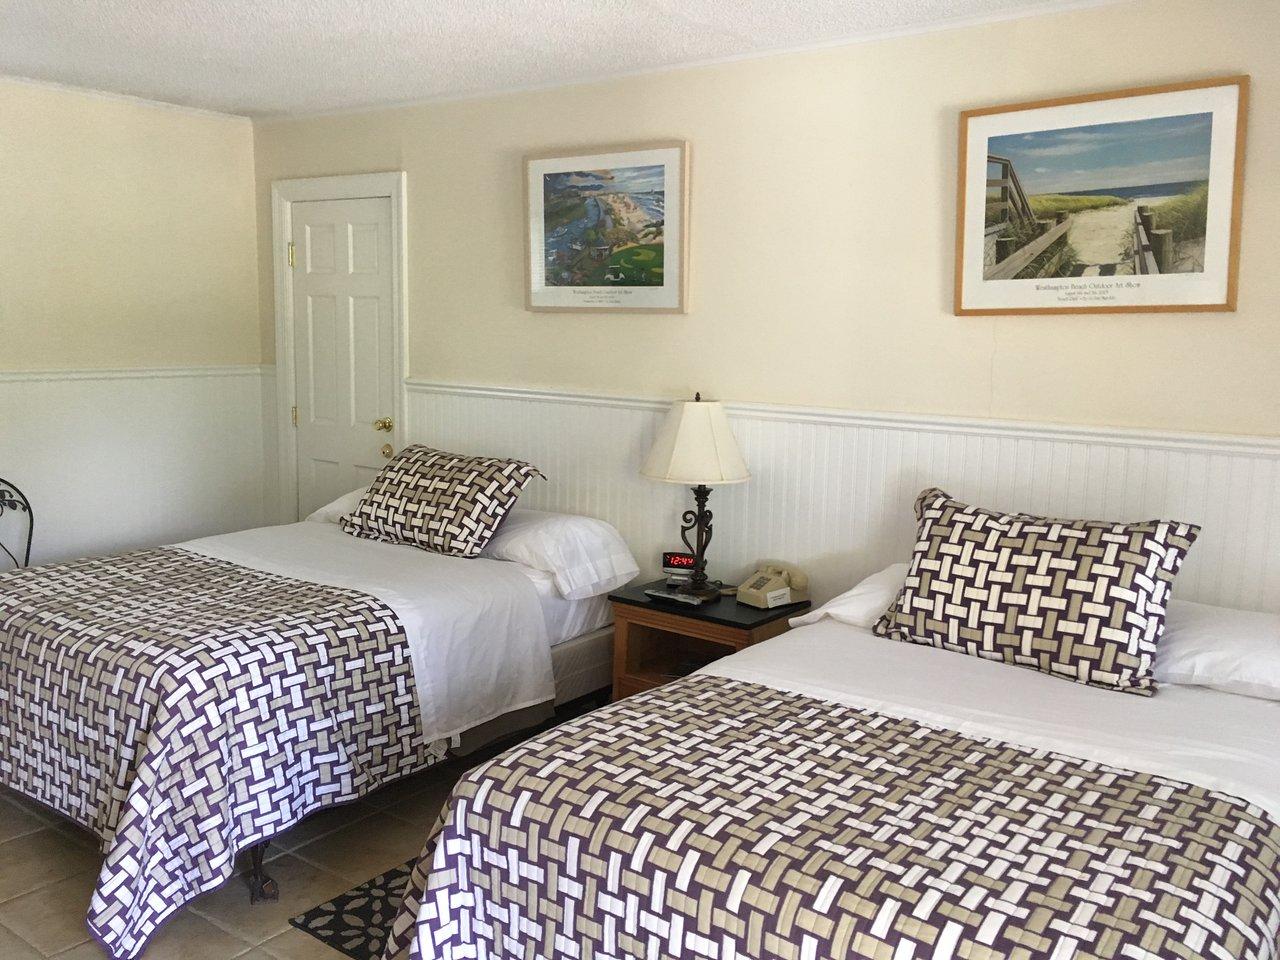 Westhampton Seabreeze Motel 94 1 0 Updated 2018 Prices Hotel Reviews Ny Tripadvisor